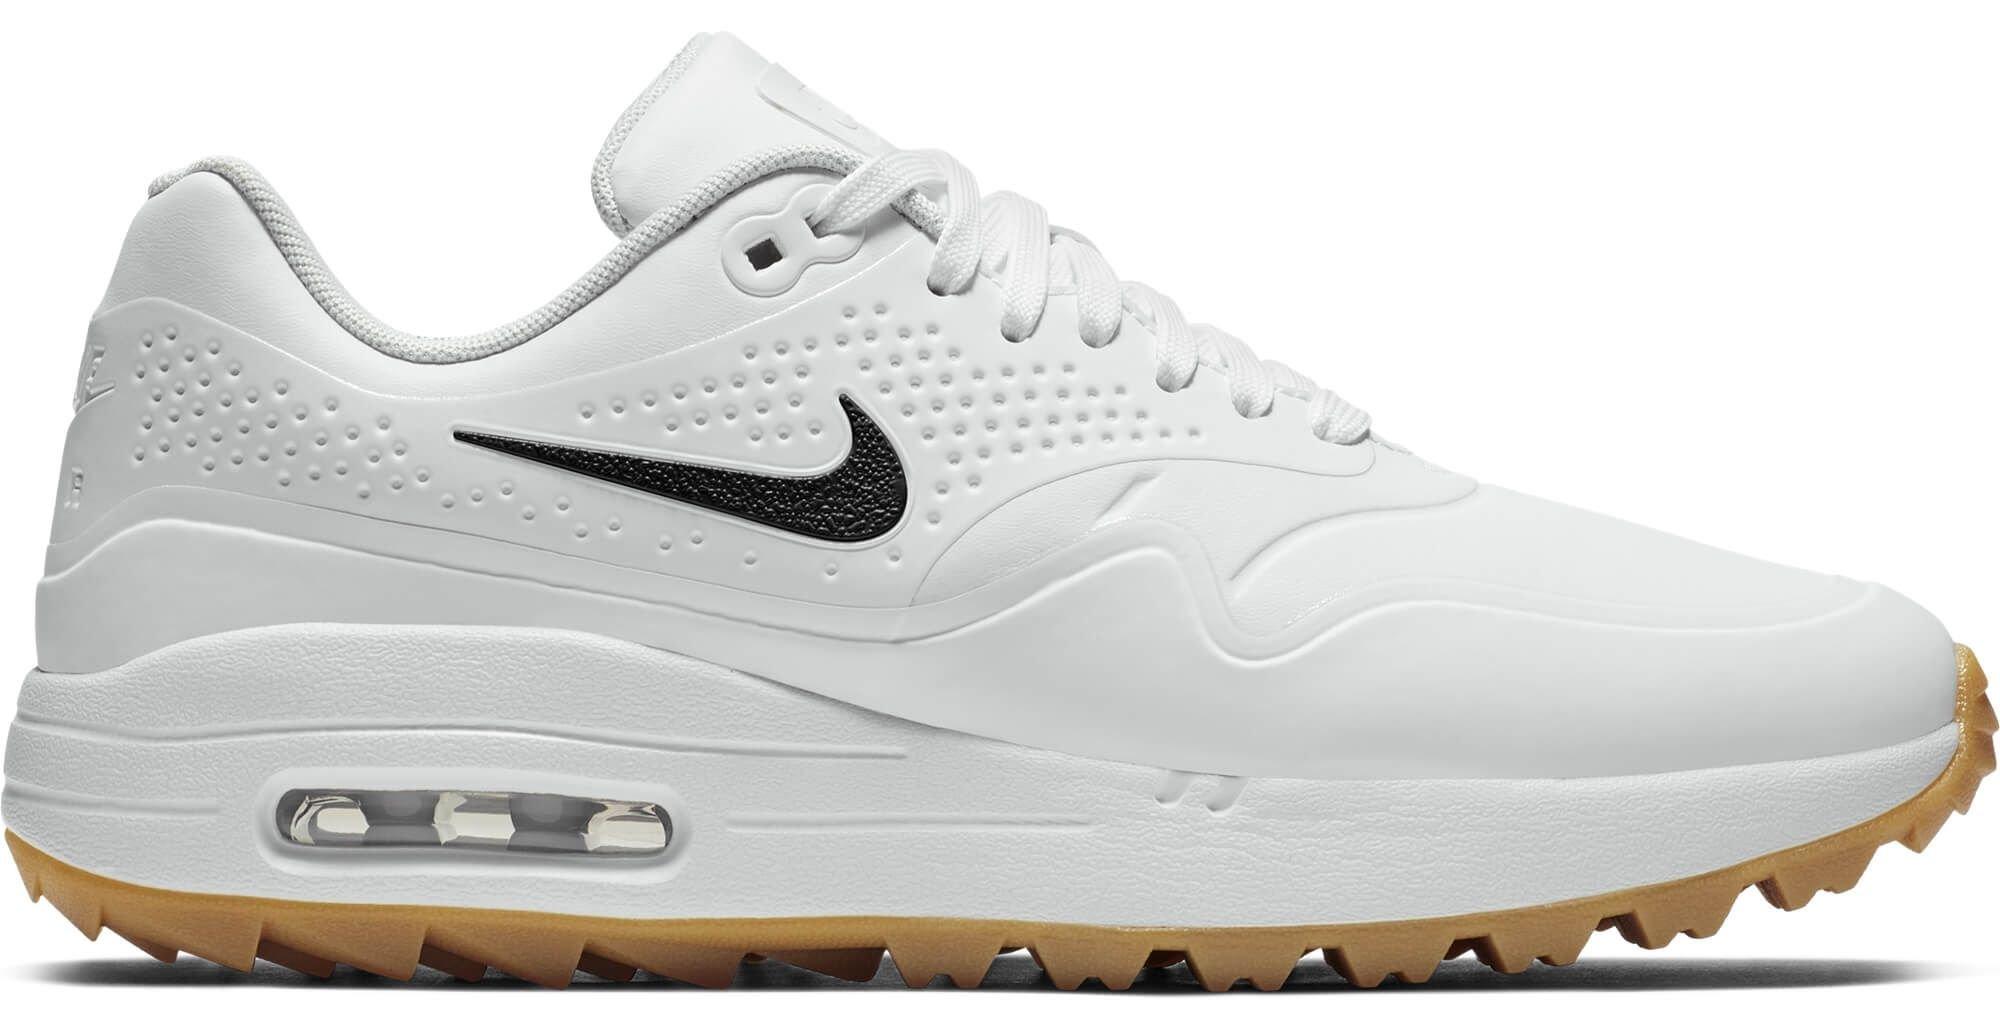 Nike Air Max 1 G Golf Shoes Contrast Swoosh White/White/Gum ...